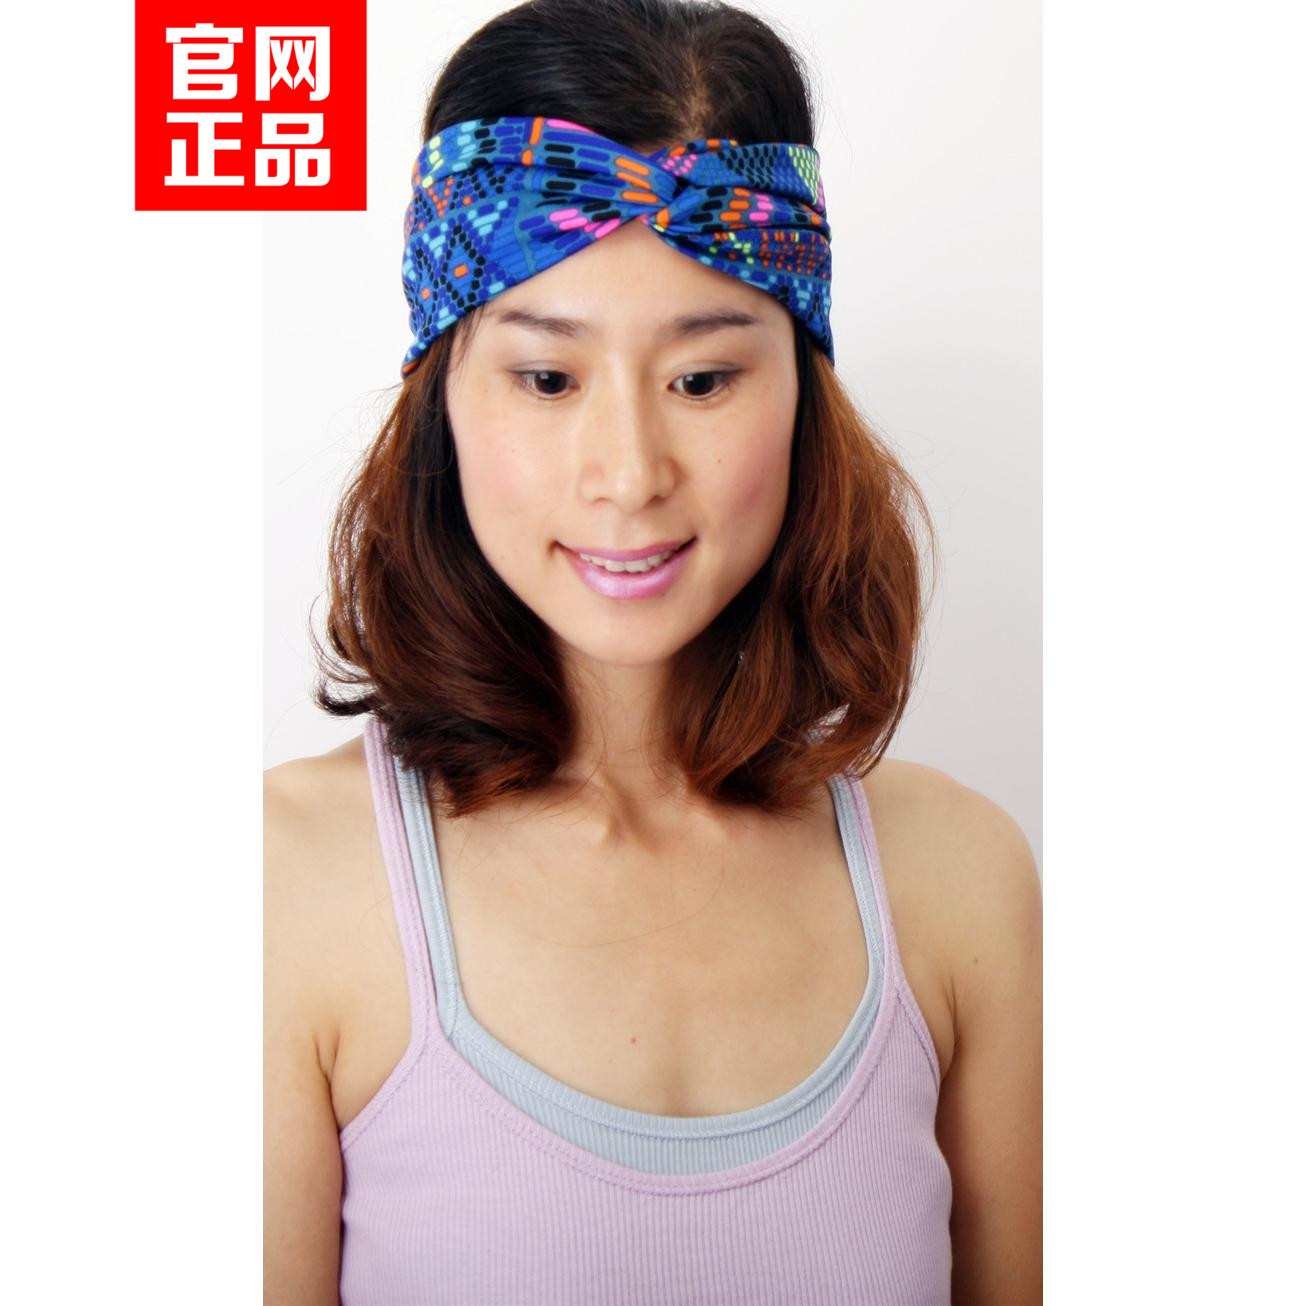 Fashion vintage cross knitted headband high quality comfortable bandanas hair accessory hair bands(China (Mainland))